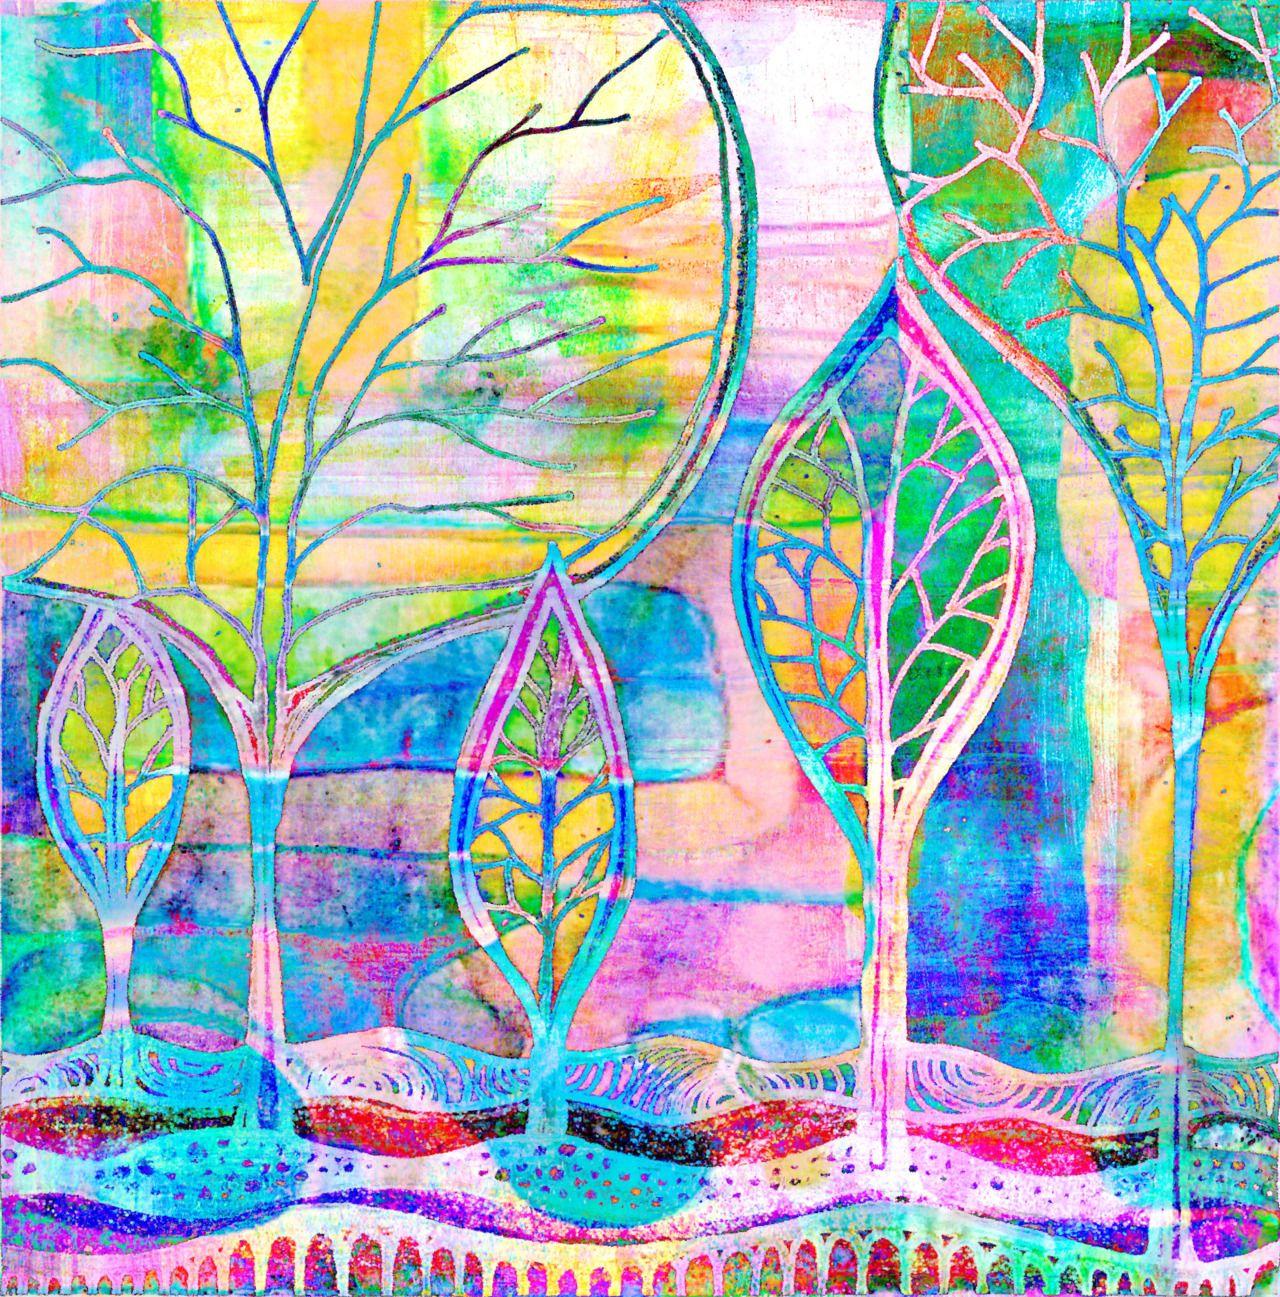 Everwood by Robbin Mead